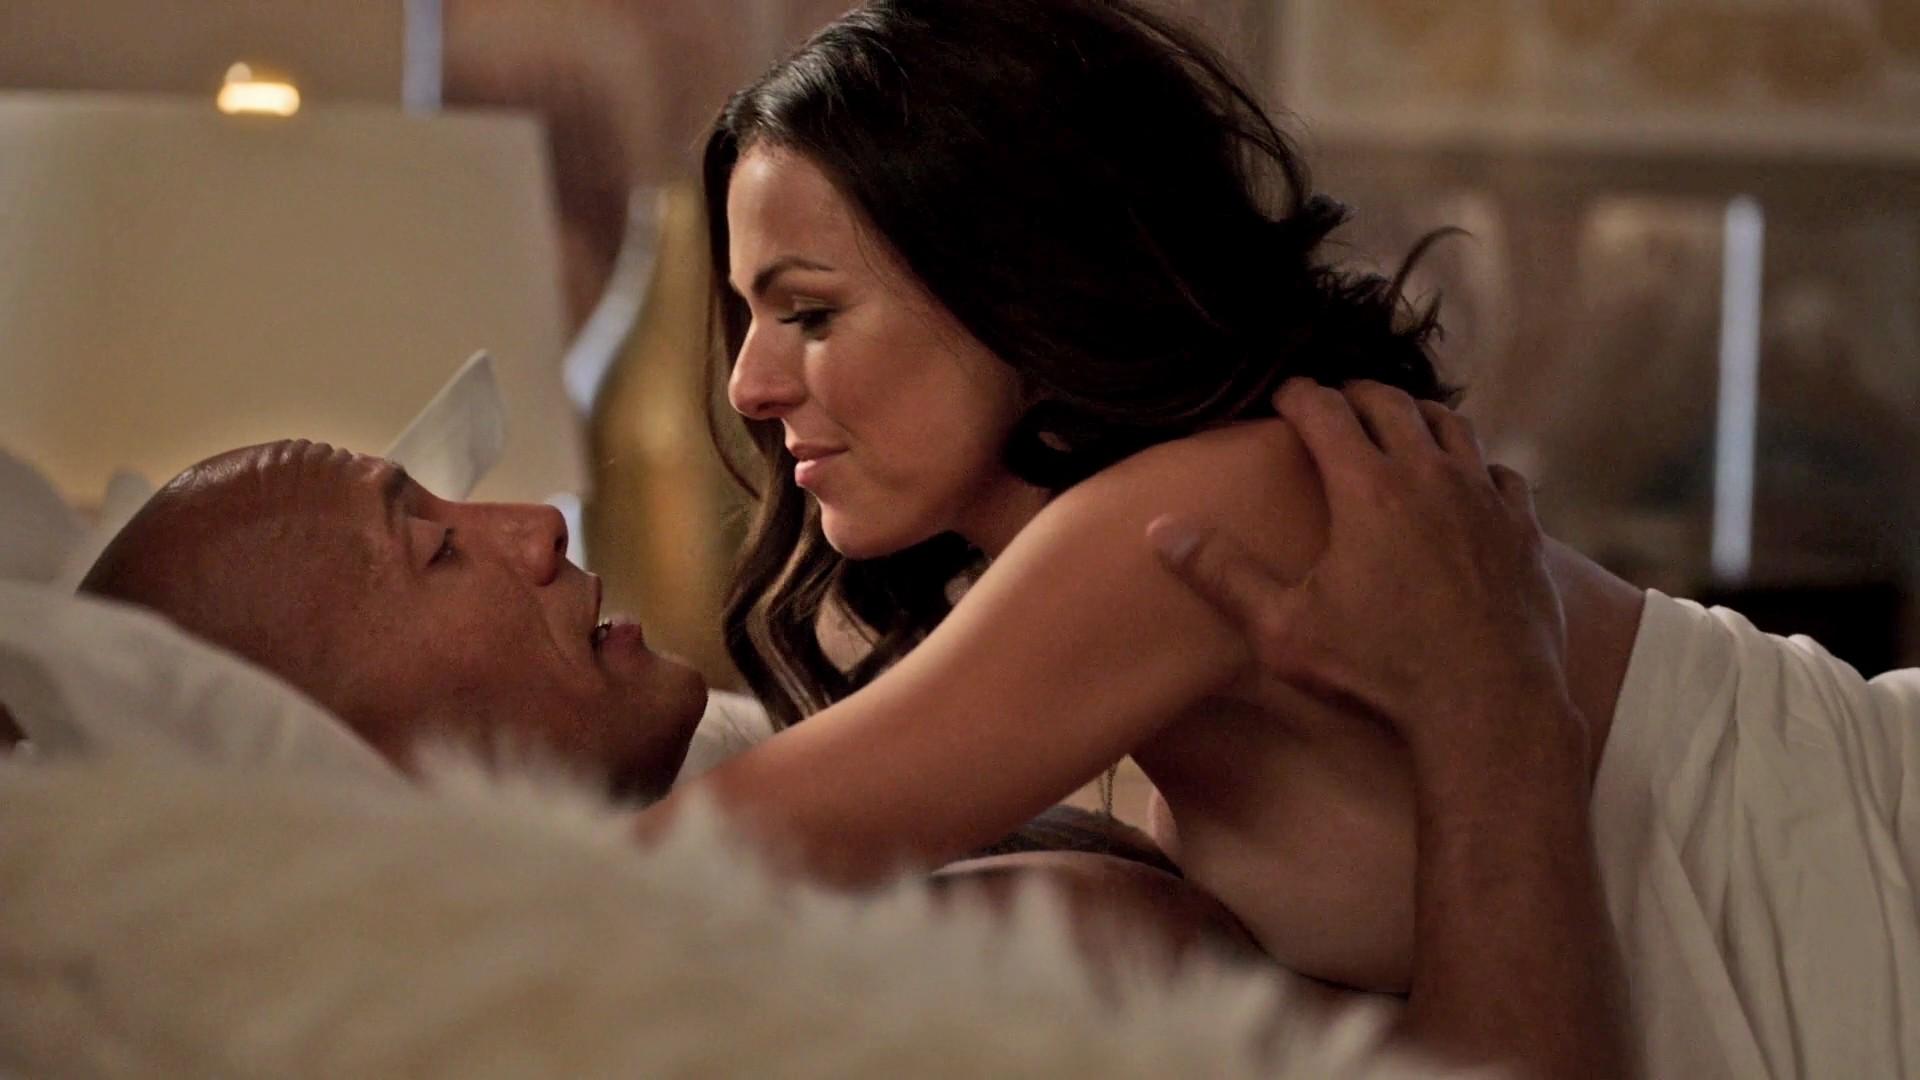 Serinda swan nude scene in chicago fire series